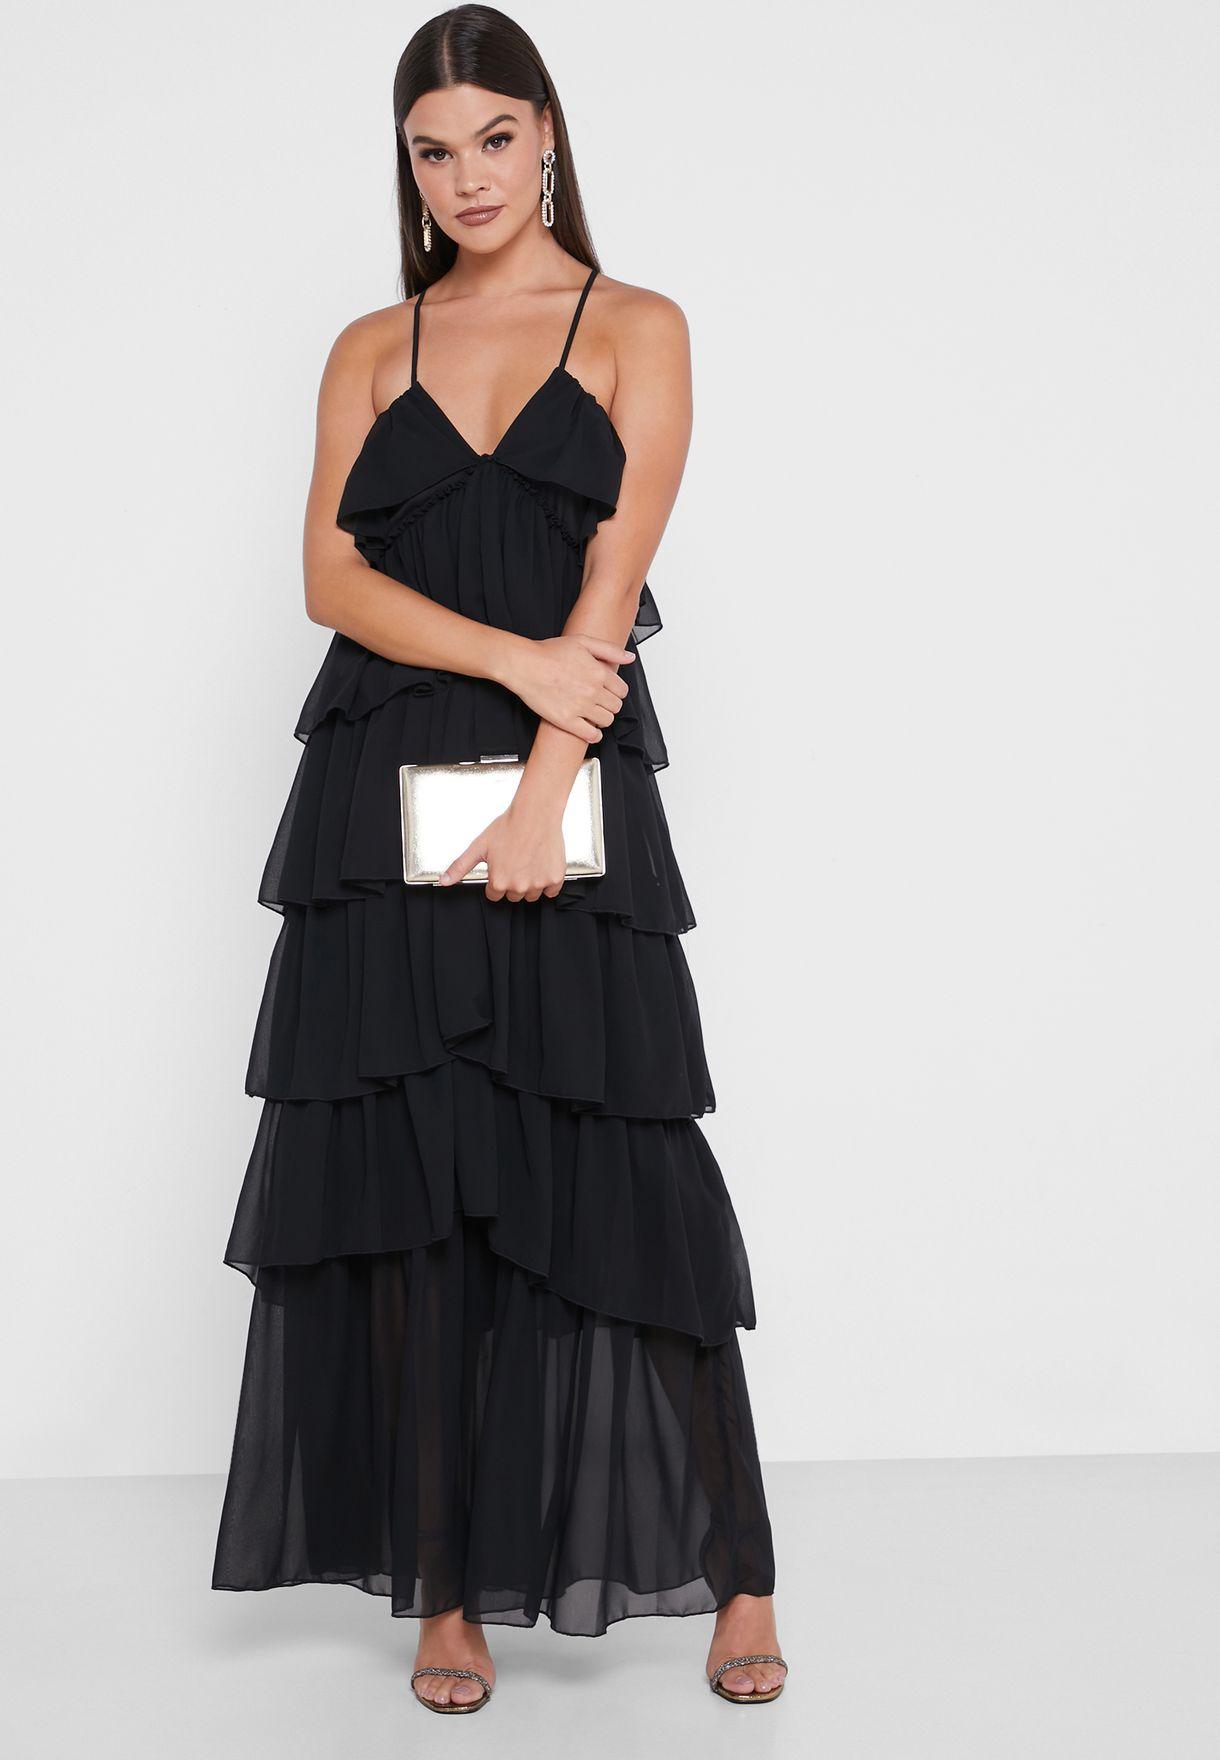 Ruffled Layered Dress